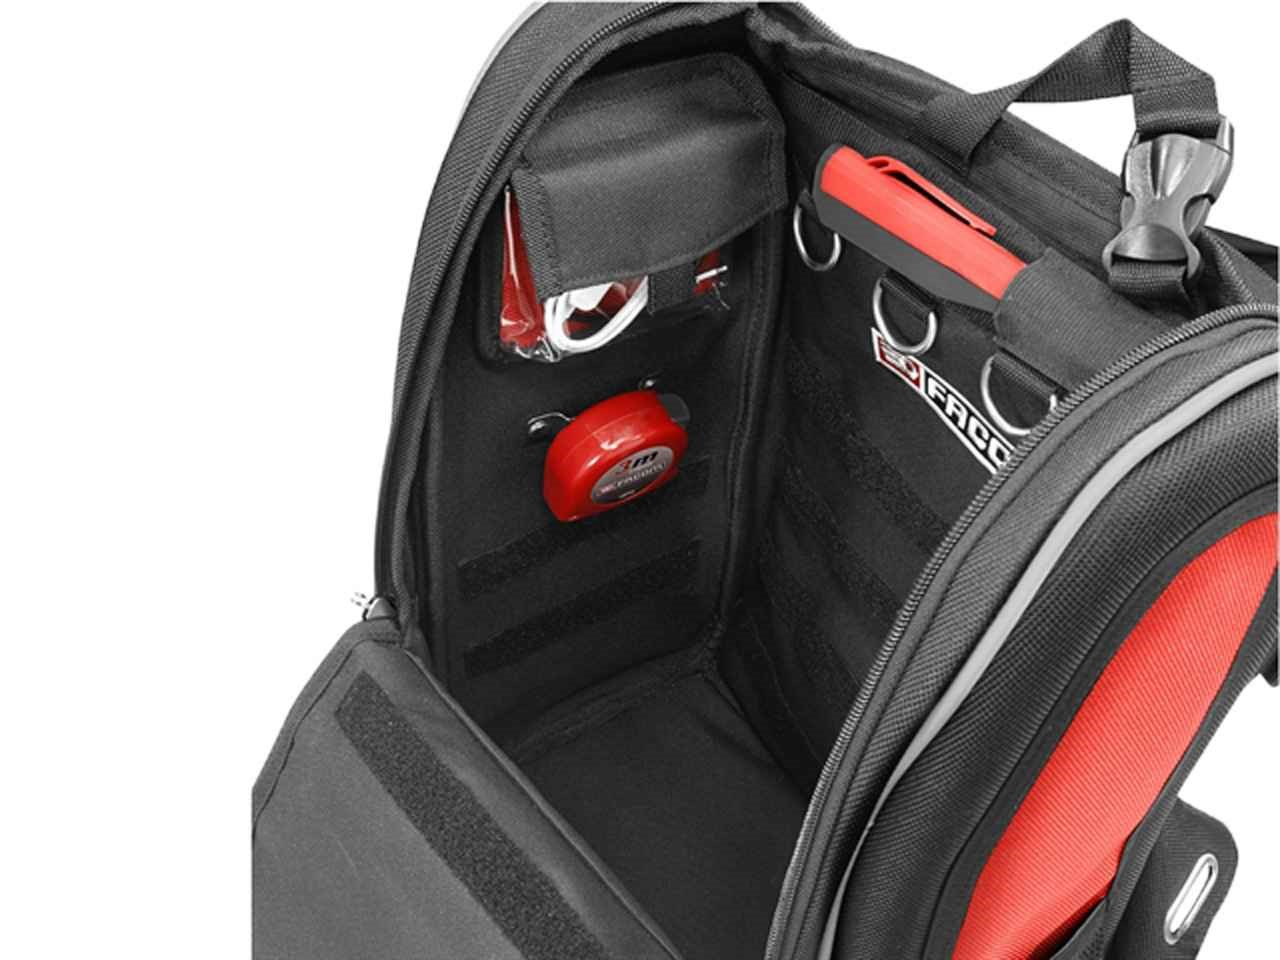 facom bs mcb modular compact backpack. Black Bedroom Furniture Sets. Home Design Ideas